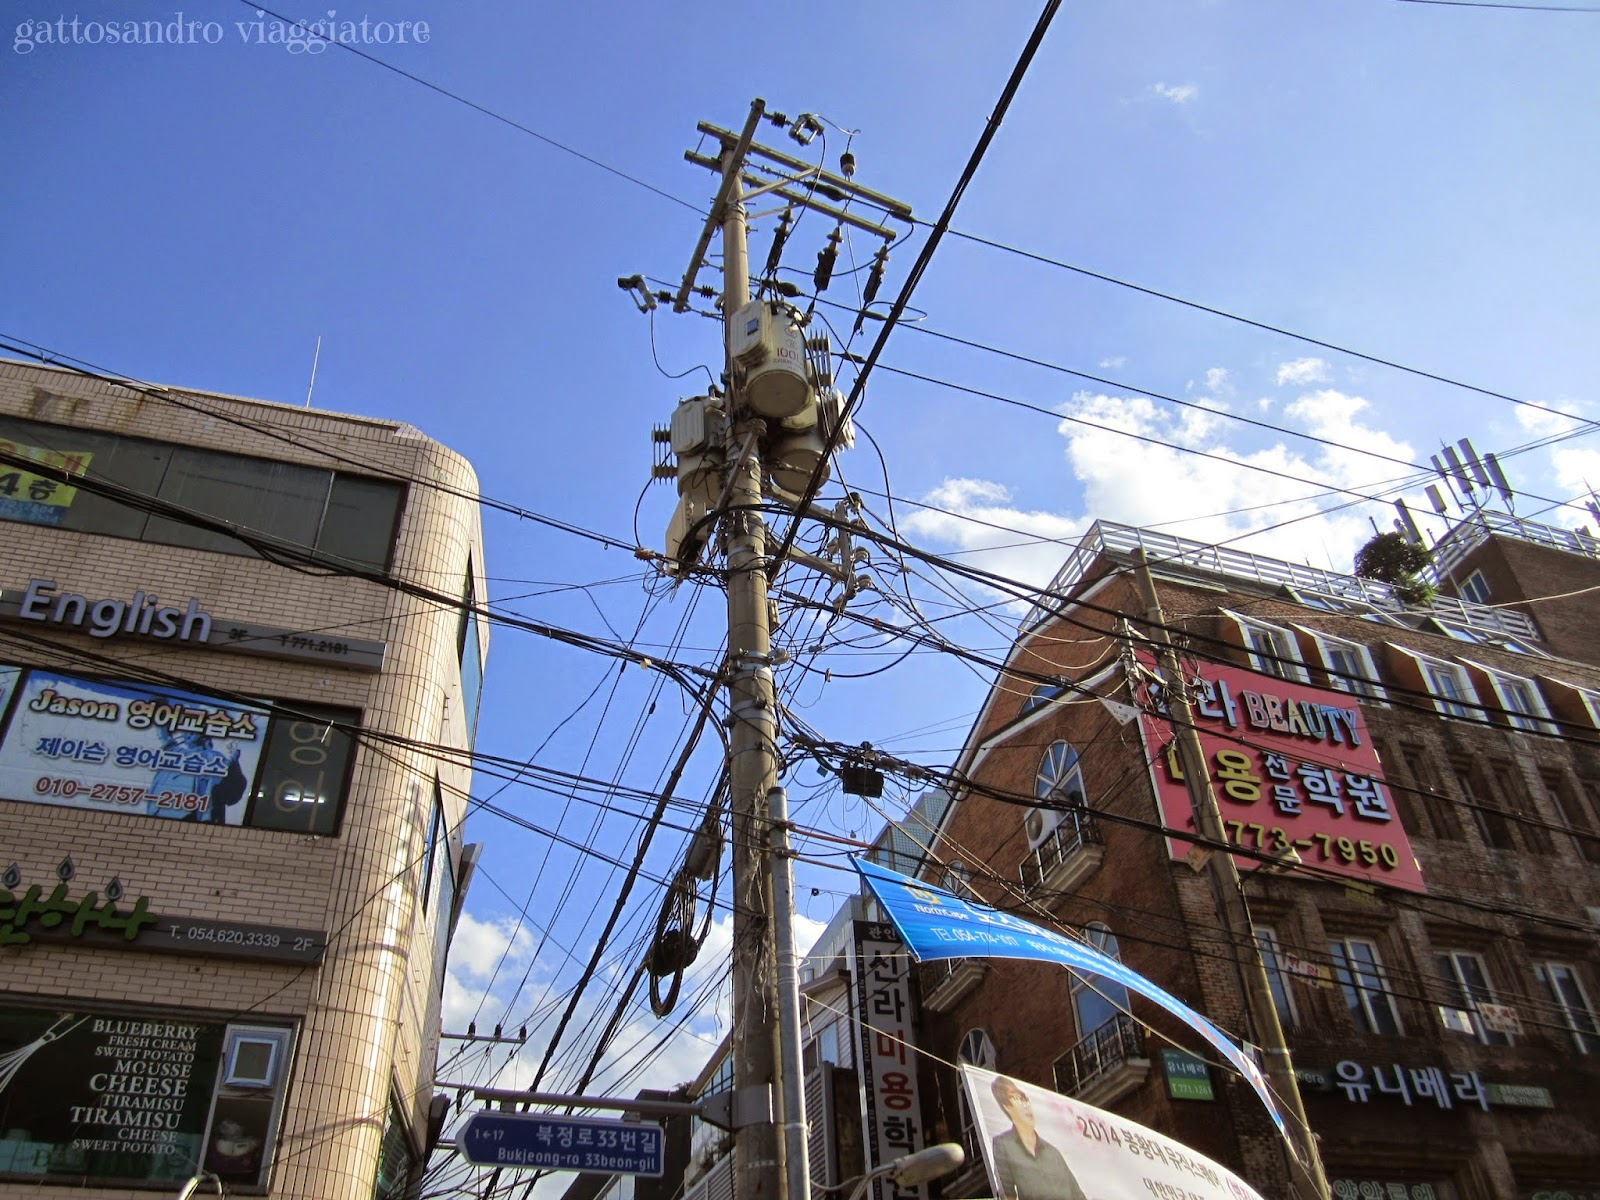 Gyeongju - groviglio di cavi